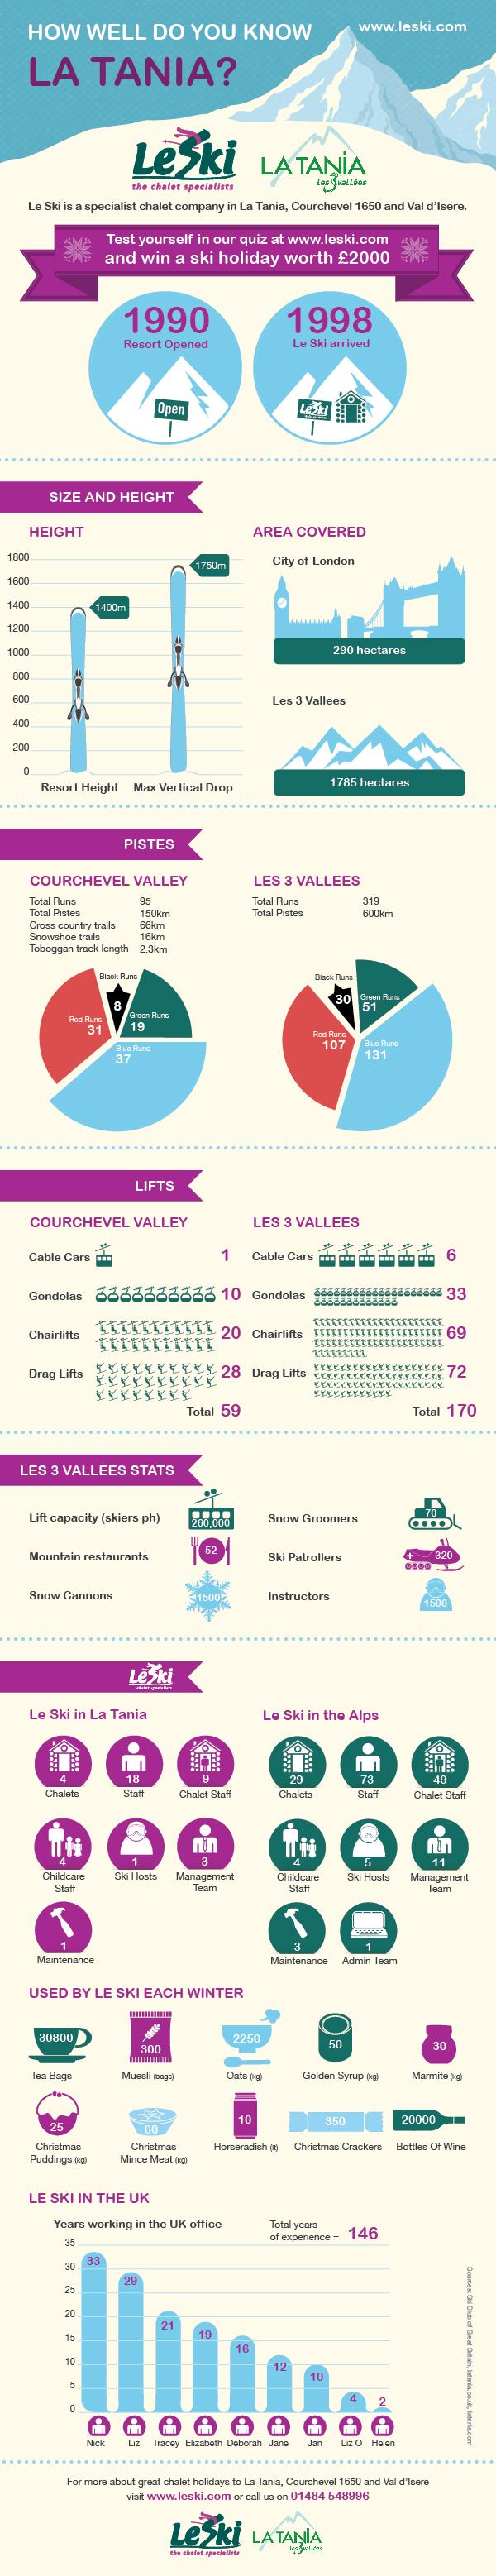 La Tania infographic